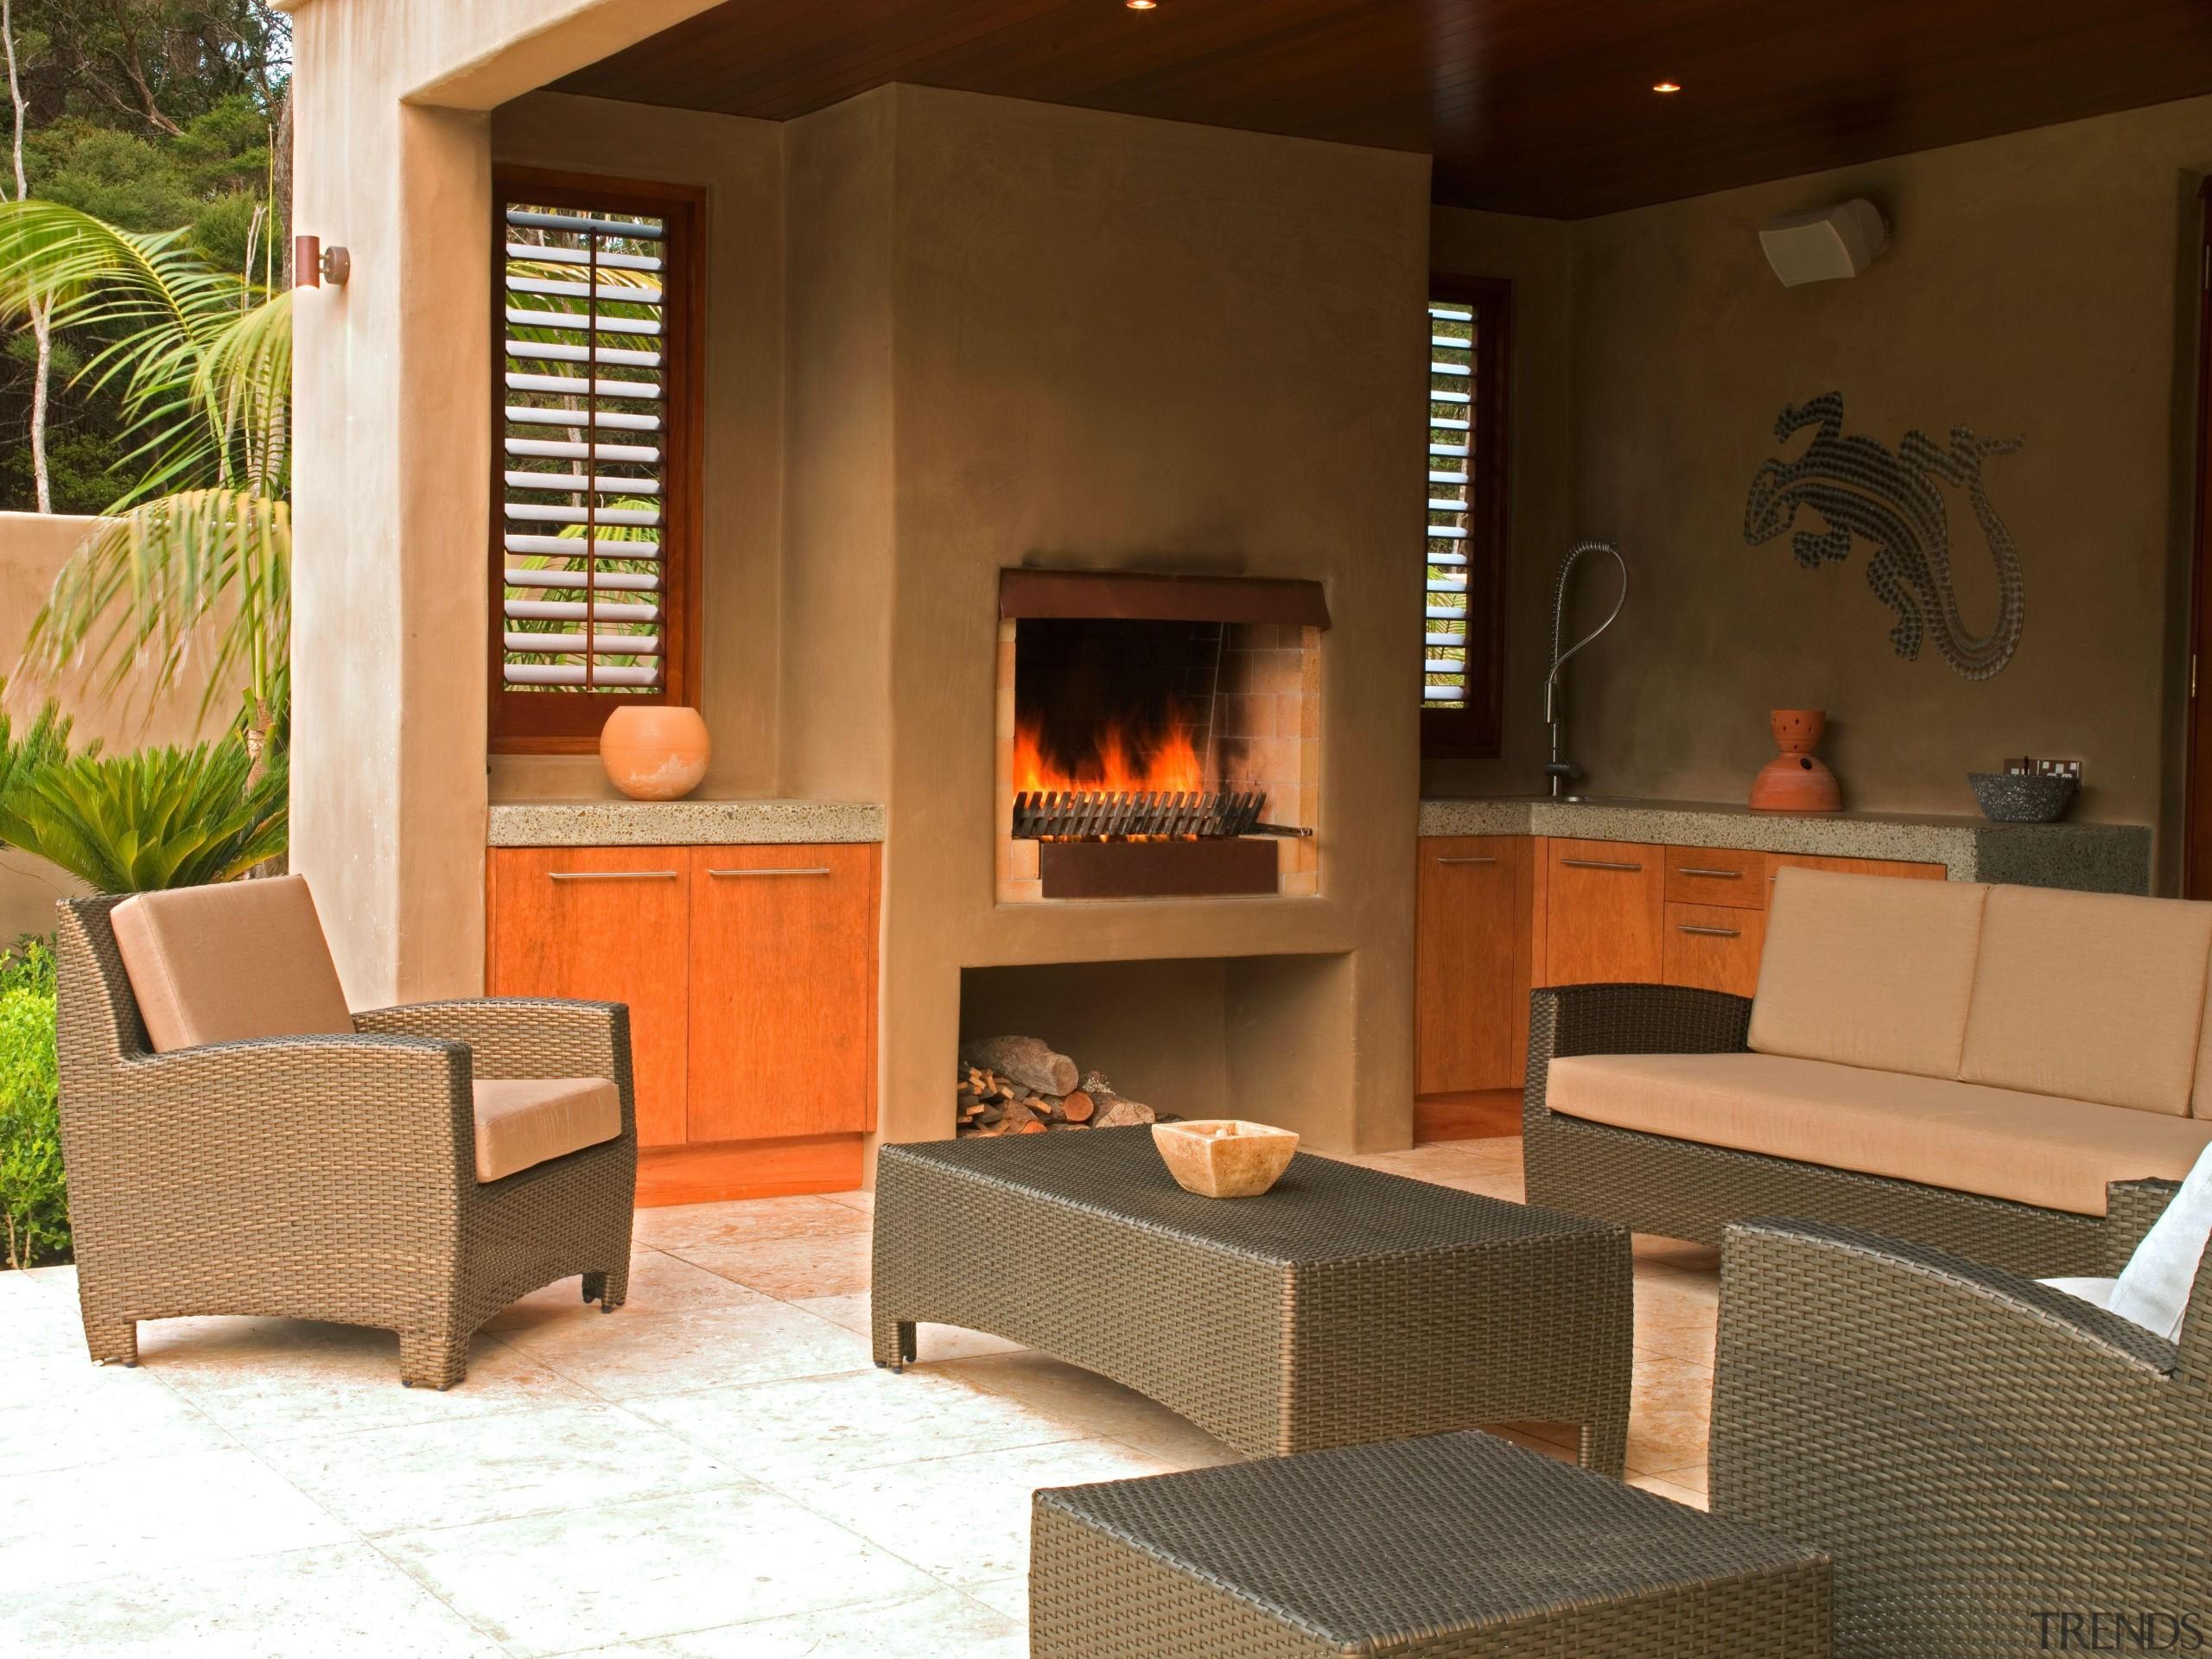 139 onetaunga fire - Onetaunga Fire - fireplace fireplace, furniture, hearth, interior design, living room, table, brown